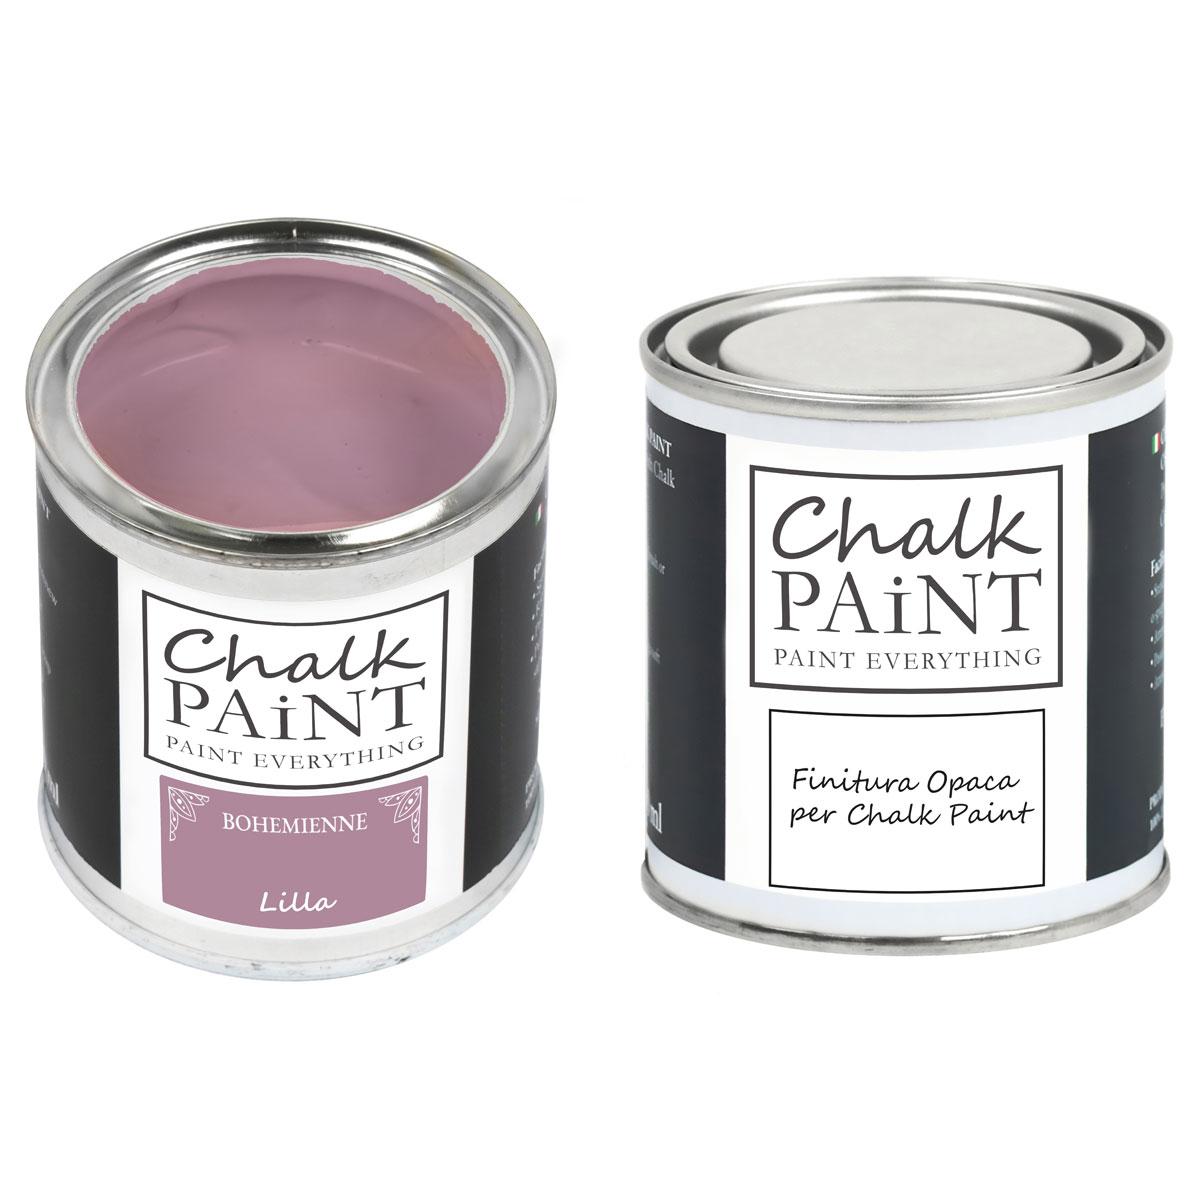 Chalk Paint Lilla paint magic